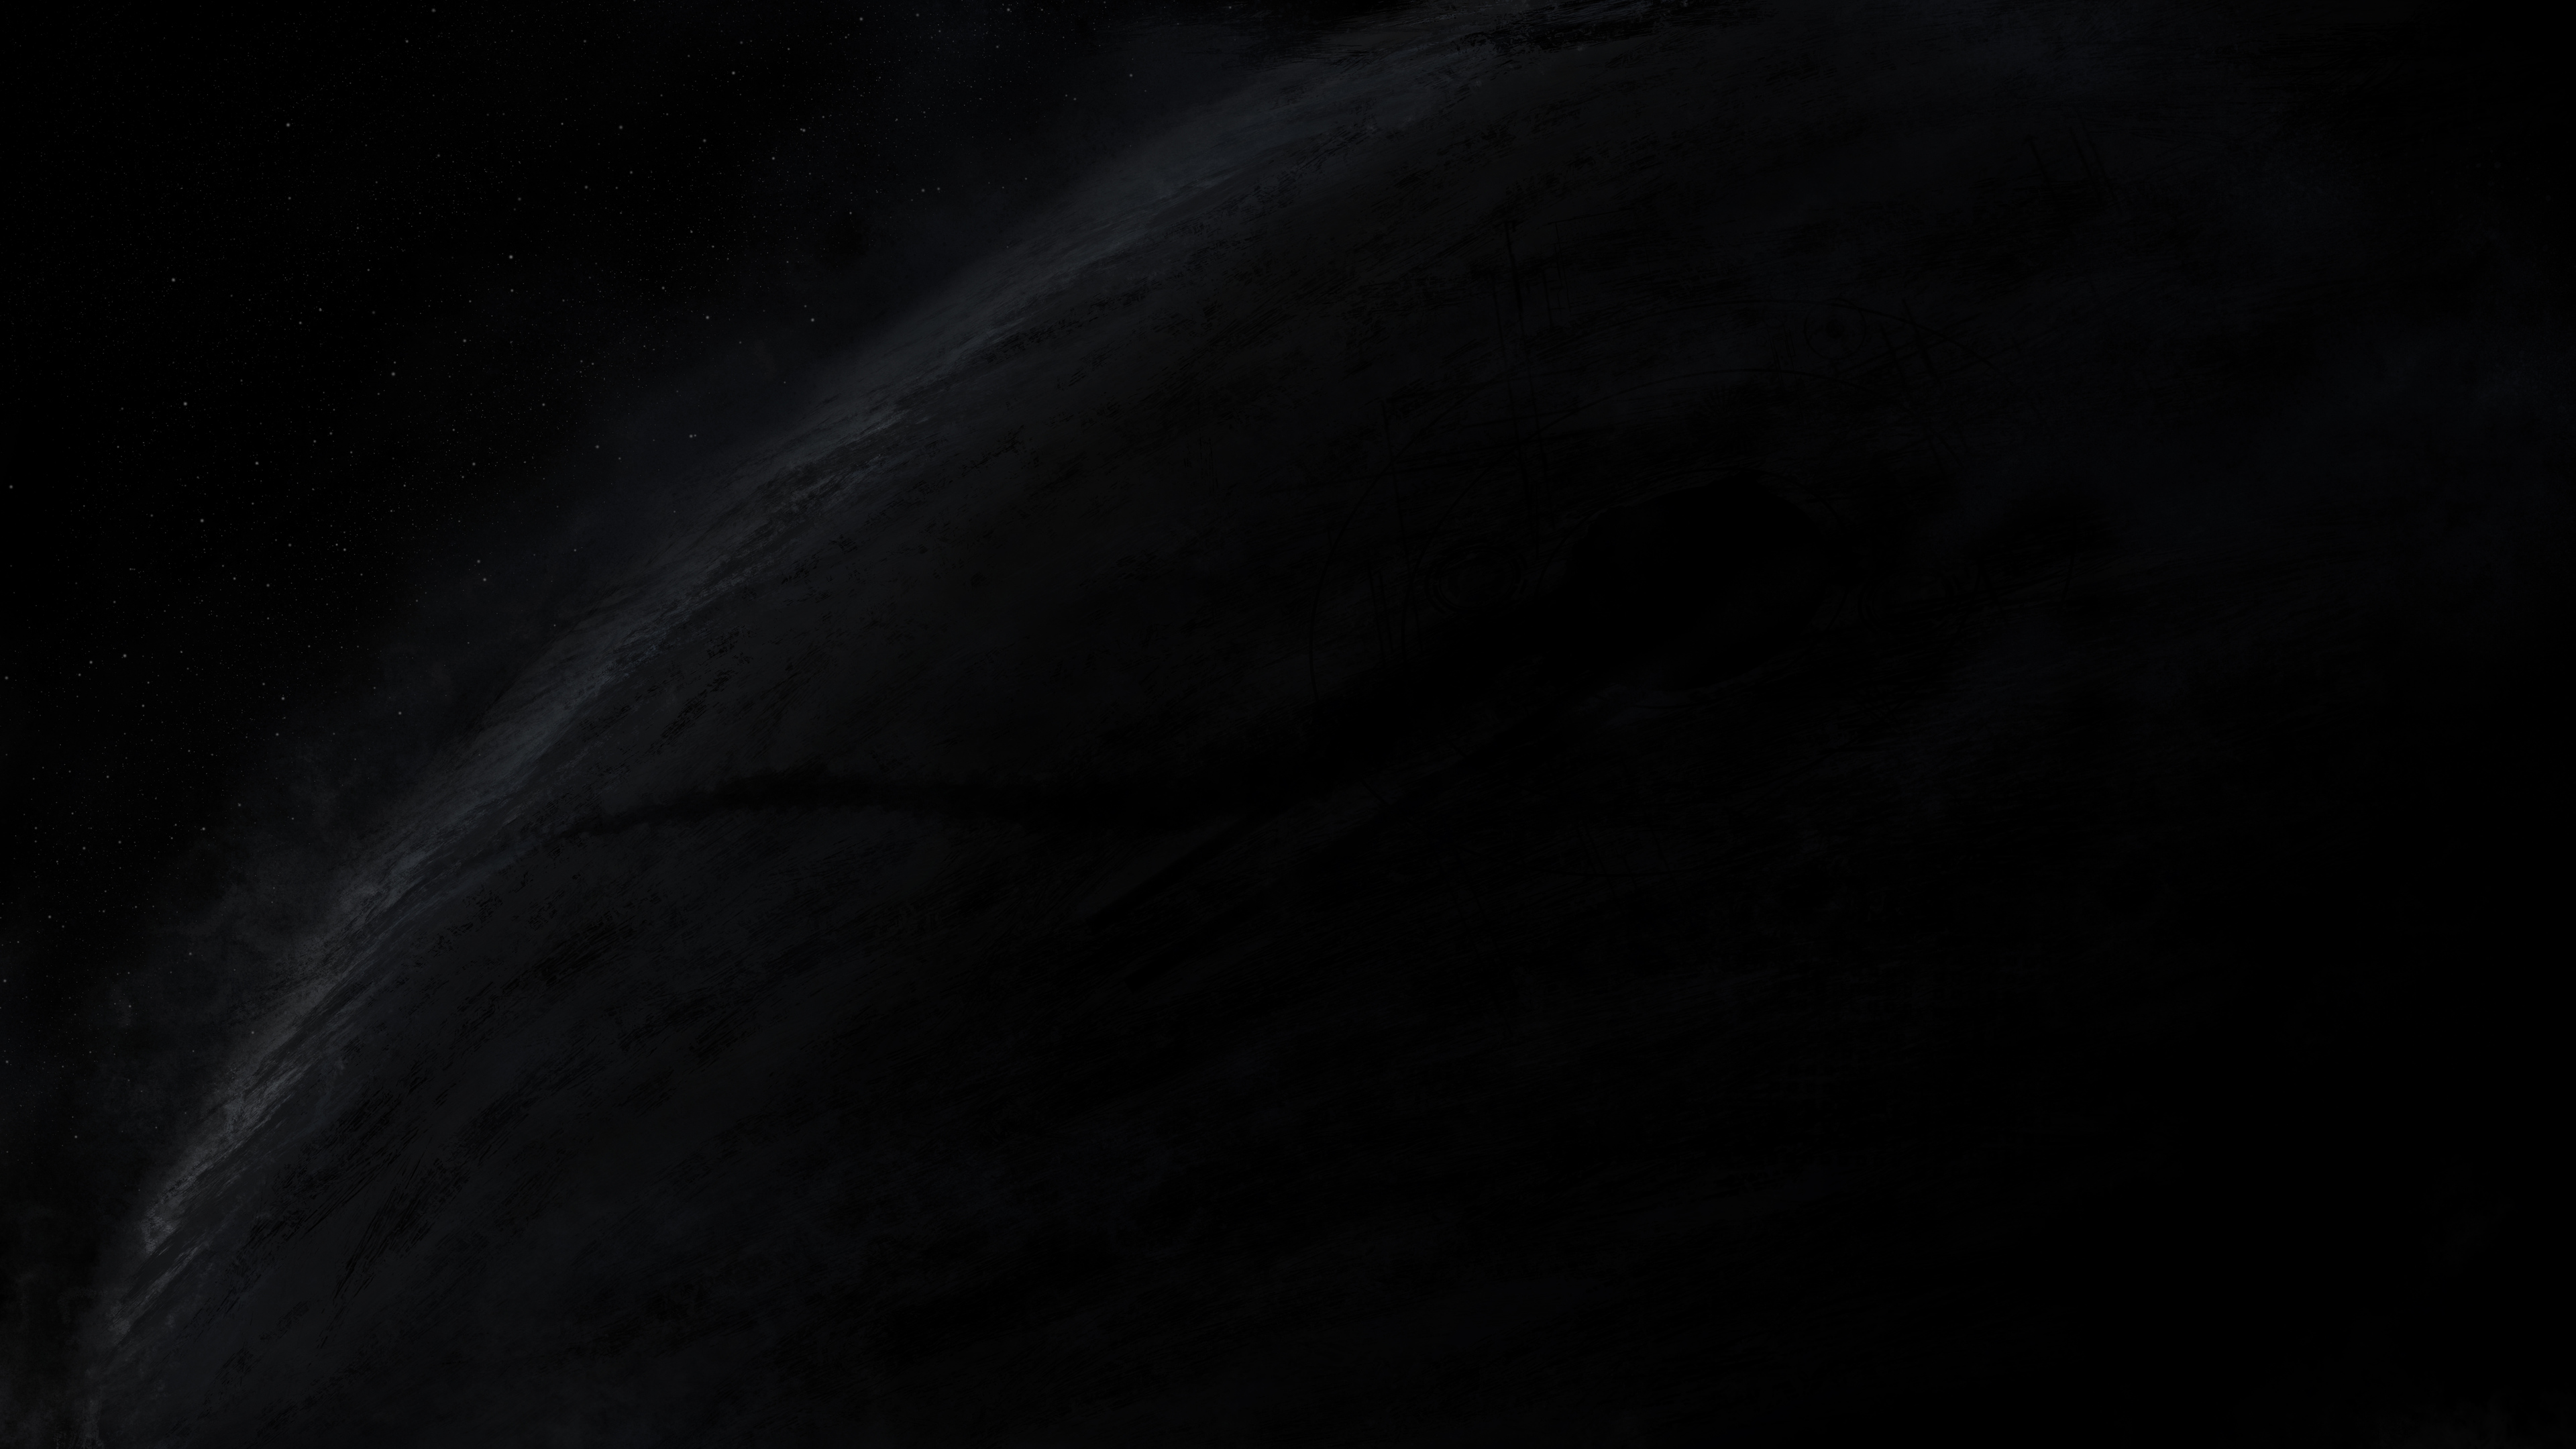 Wallpaper 4k Dark Black Simple Background 4k 4k Wallpapers Dark Wallpapers Deviantart Wallpapers Hd Wallpapers Simple Background Wallpapers